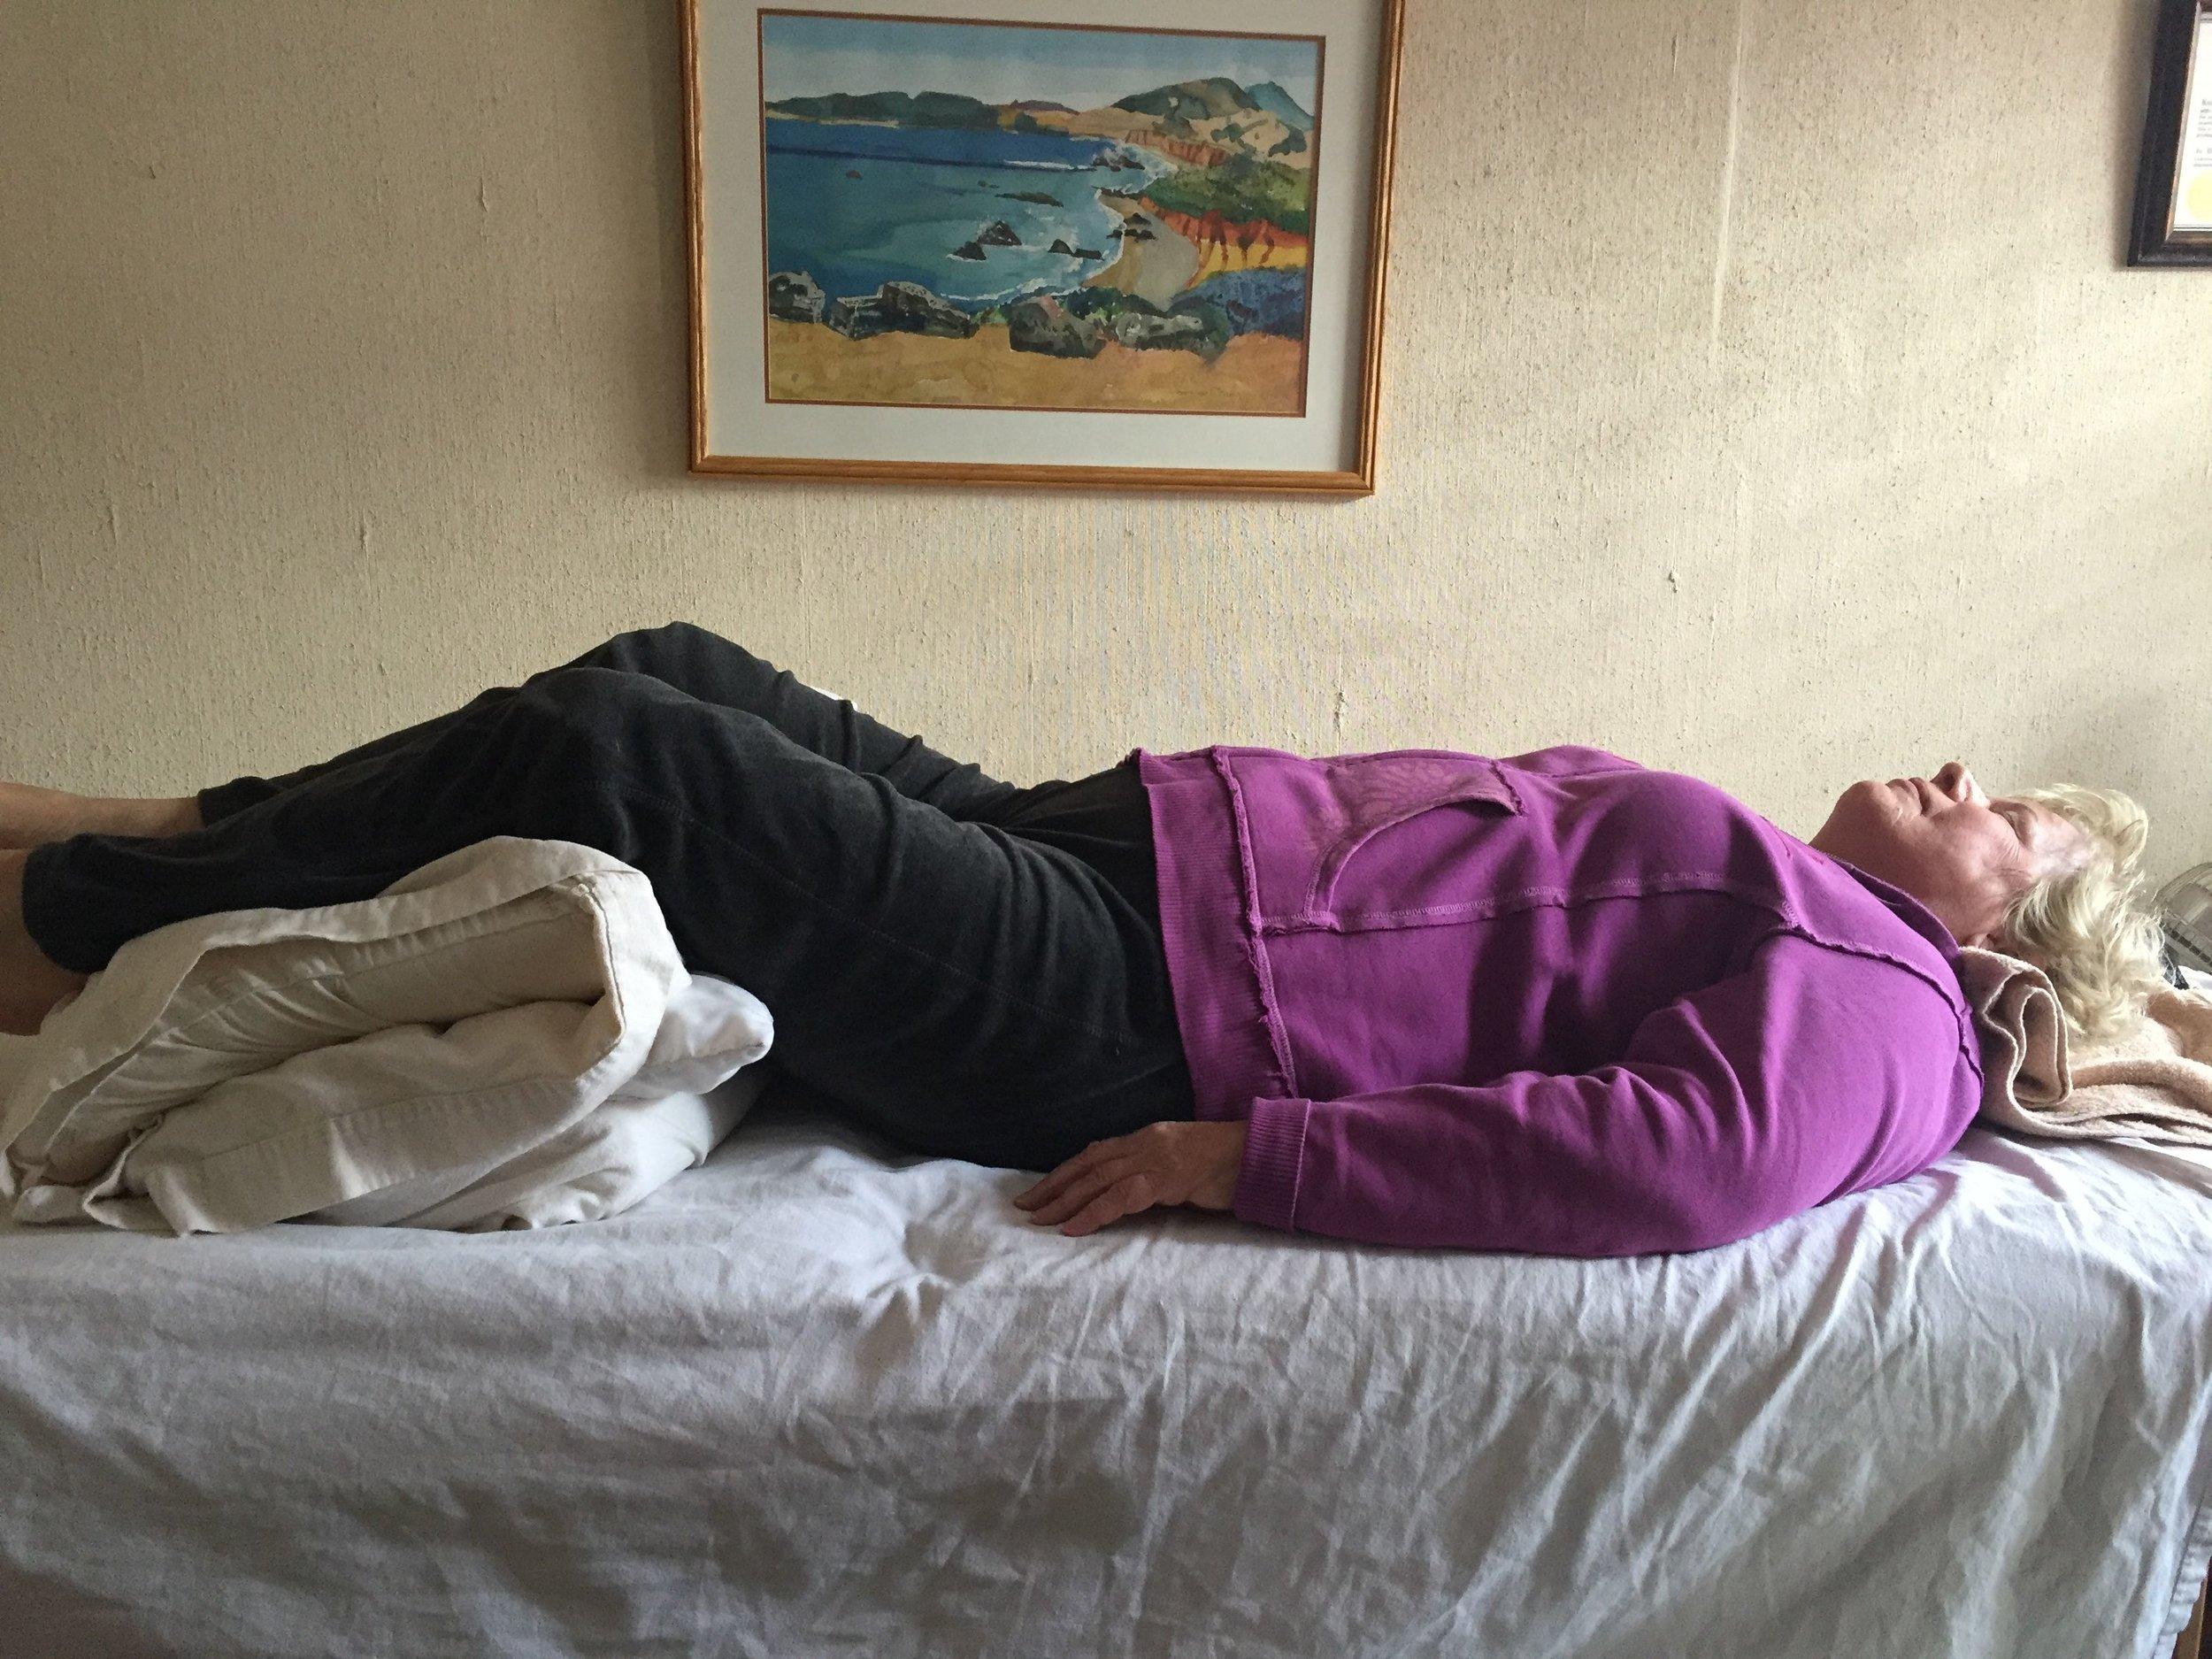 pose to decrease back pain